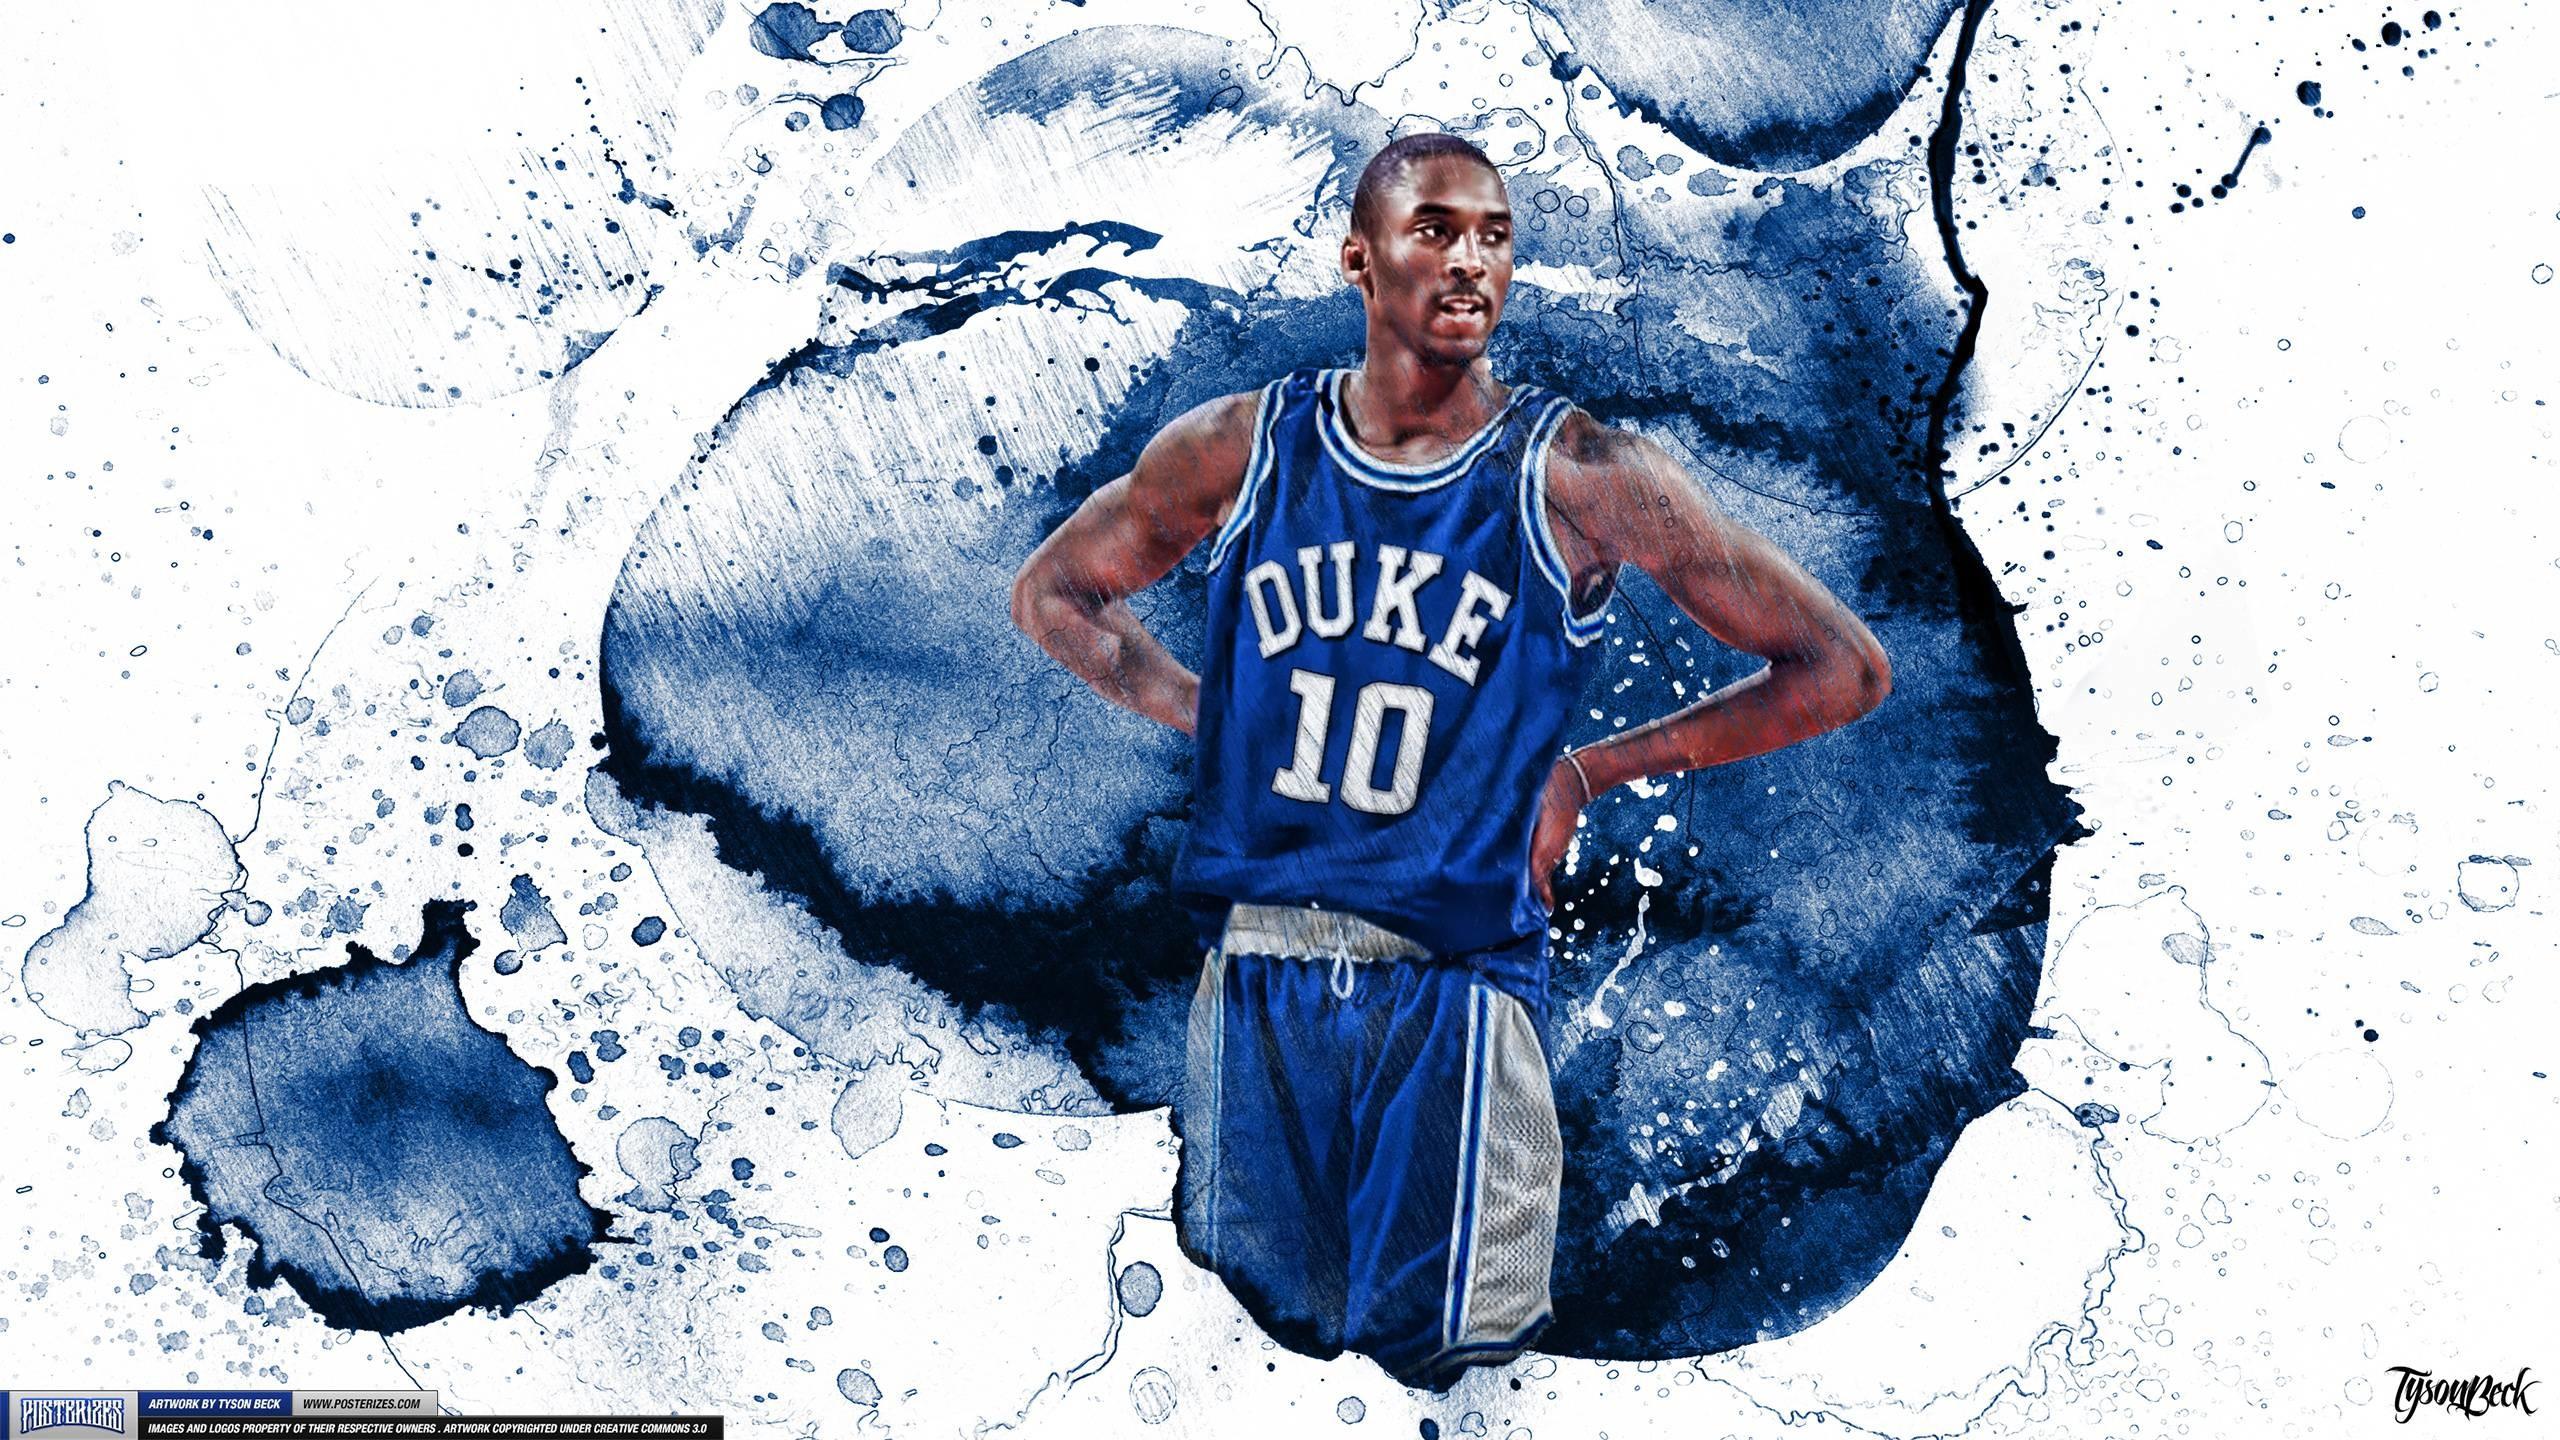 Kobe vs Lebron College Basketball Wallpaper Streetball free duke .